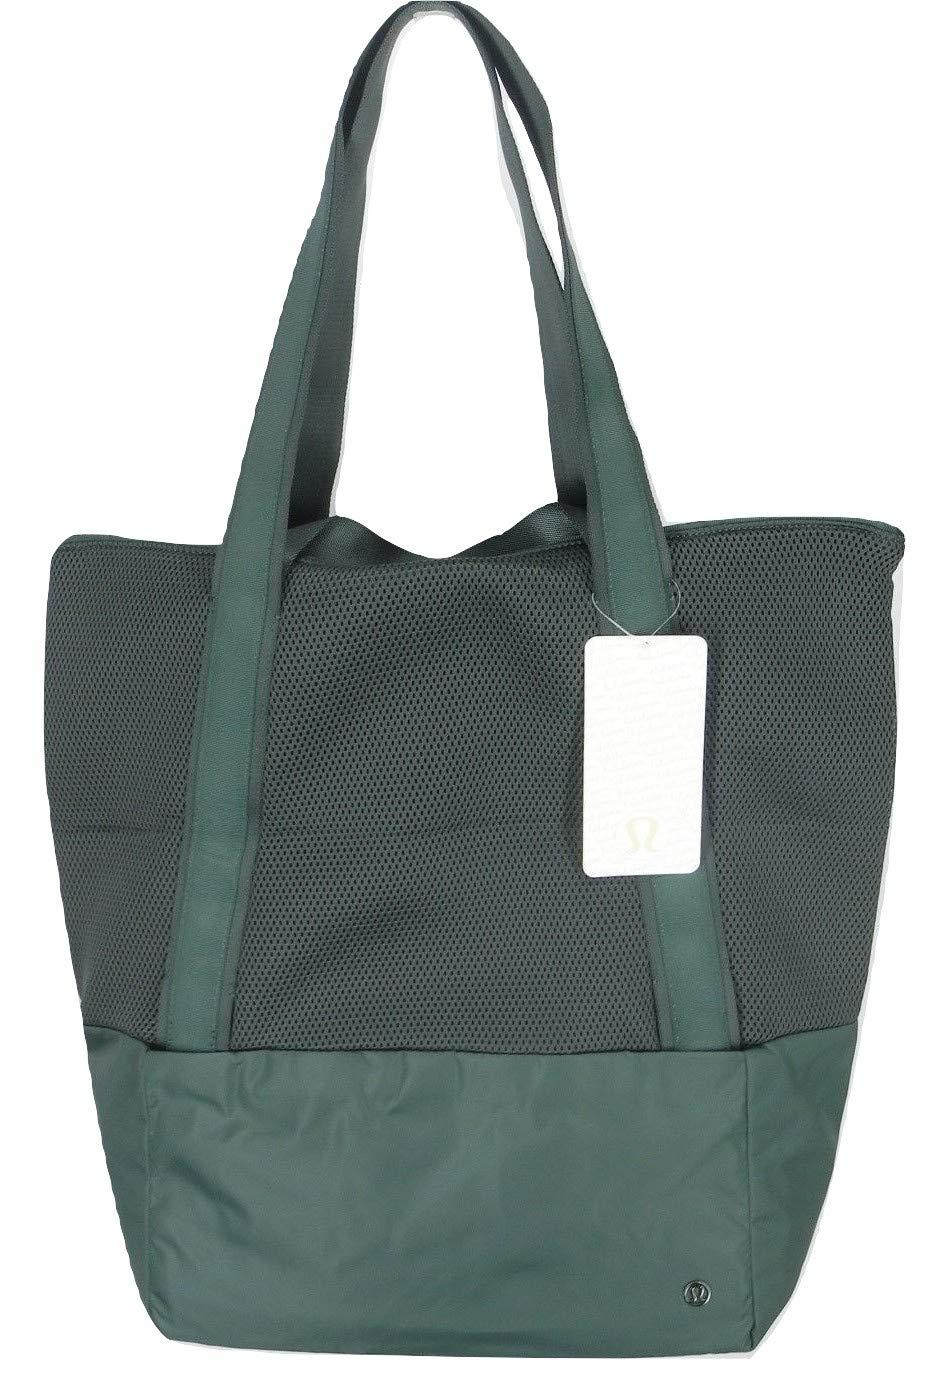 Lululemon Cobalt Green HOT MESH BAG Yoga Gym   Traveling Shopping Versatile  Tote 5f13e0bba382f